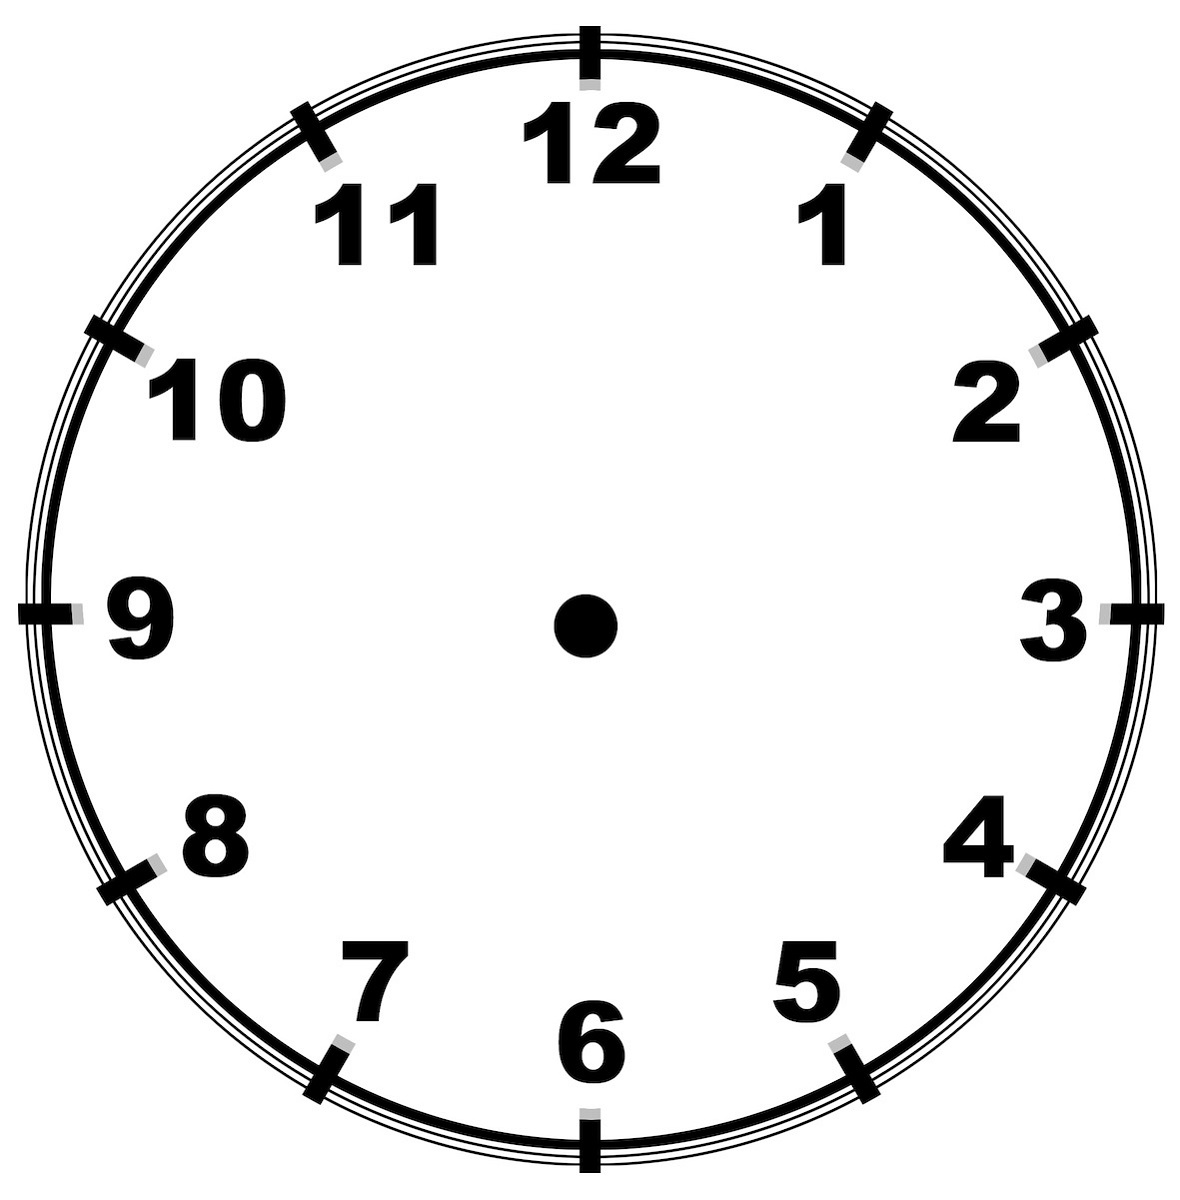 blank clock face templates